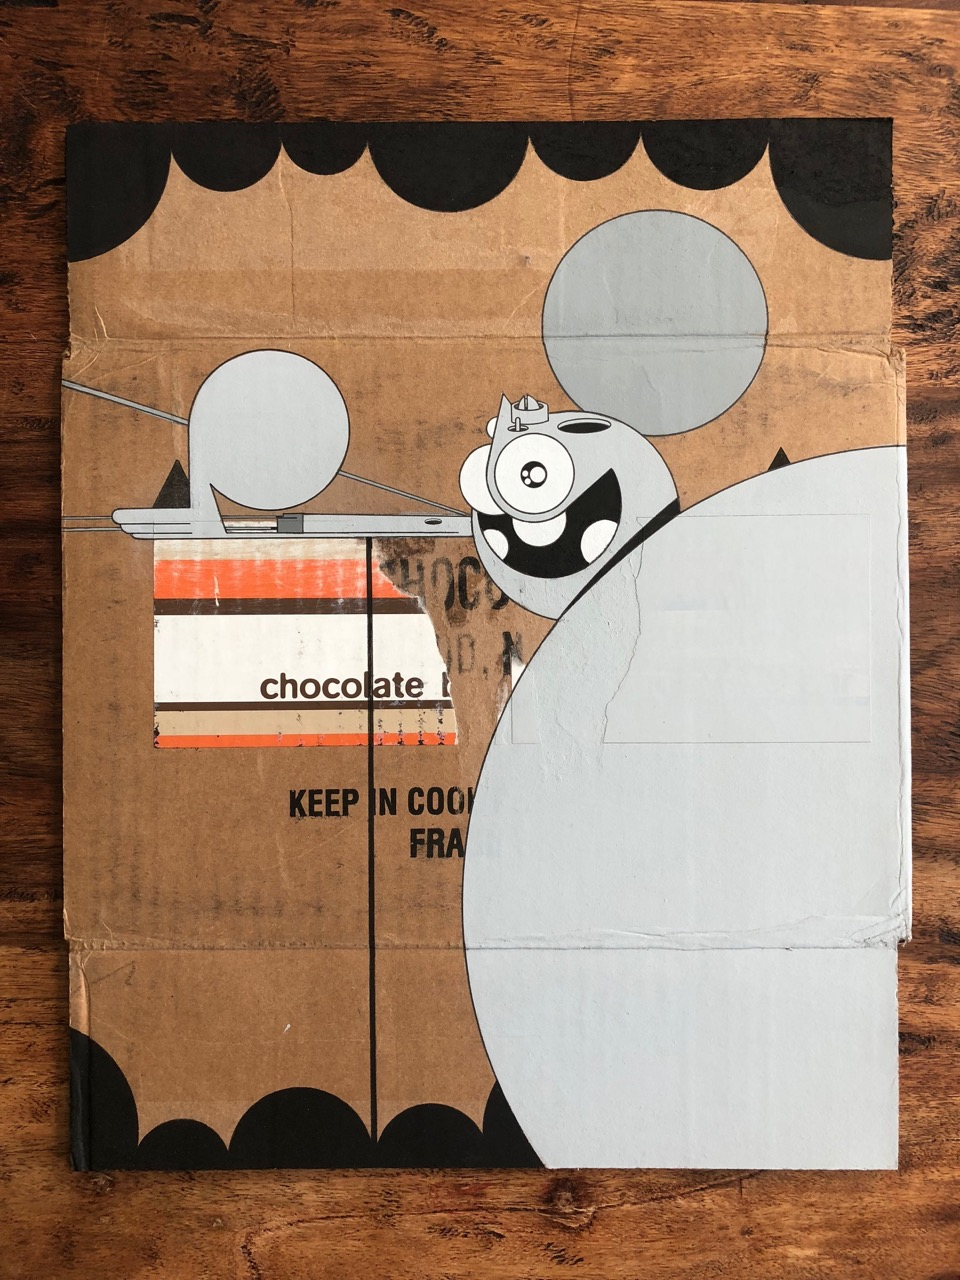 Dalek_Older-Work-on-Cardboard-2-14x20